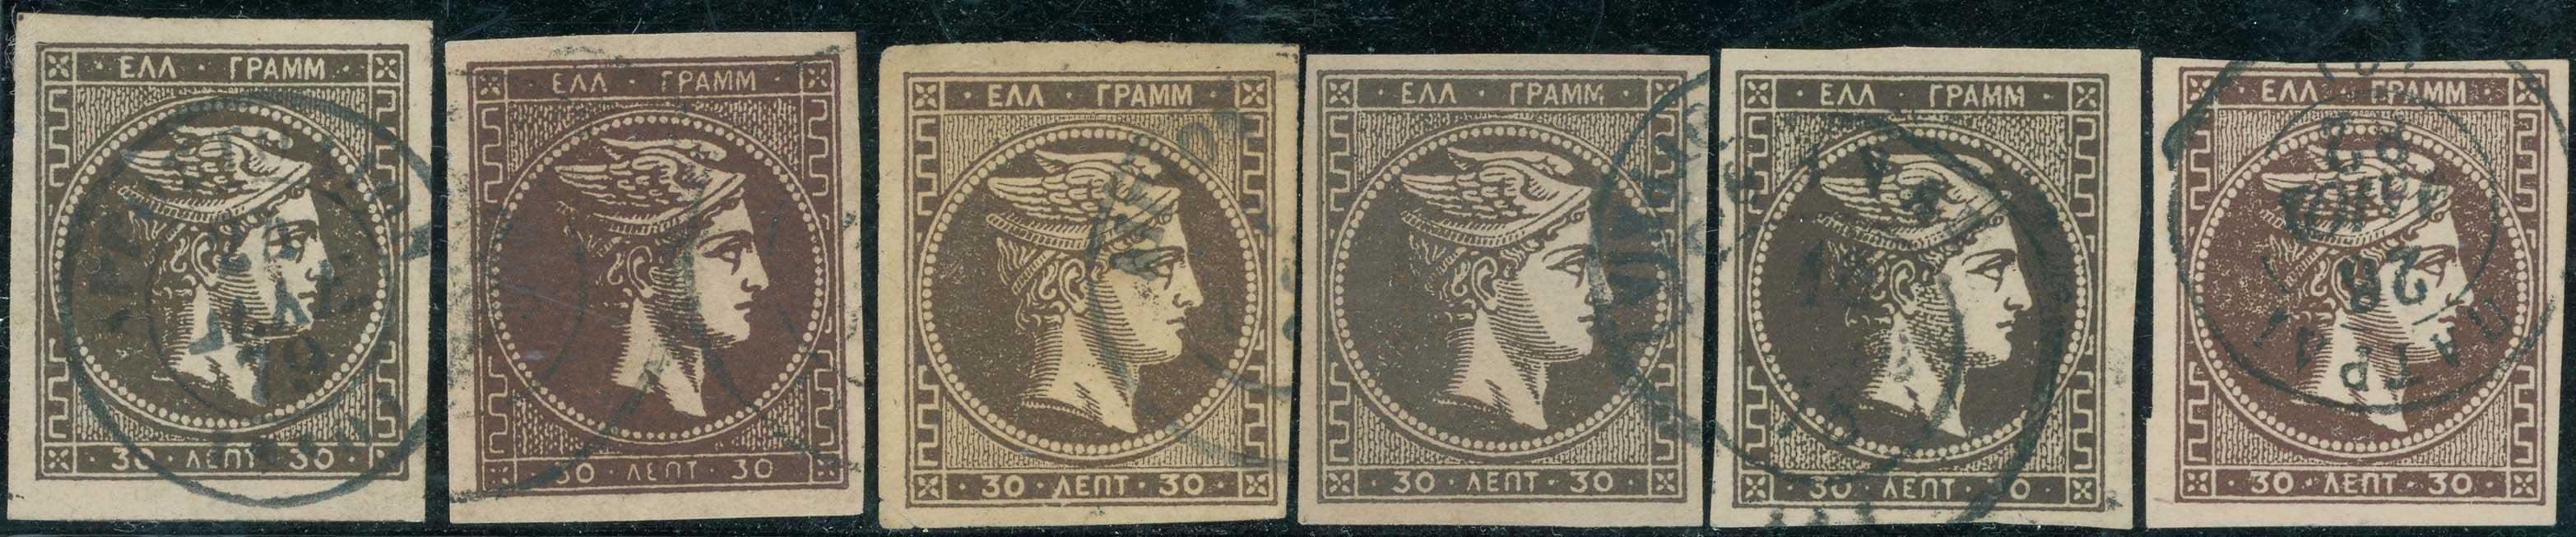 Lot 216 - large hermes head 1876/77 athens printing -  A. Karamitsos Postal & Live Internet Auction 680 General Philatelic Auction